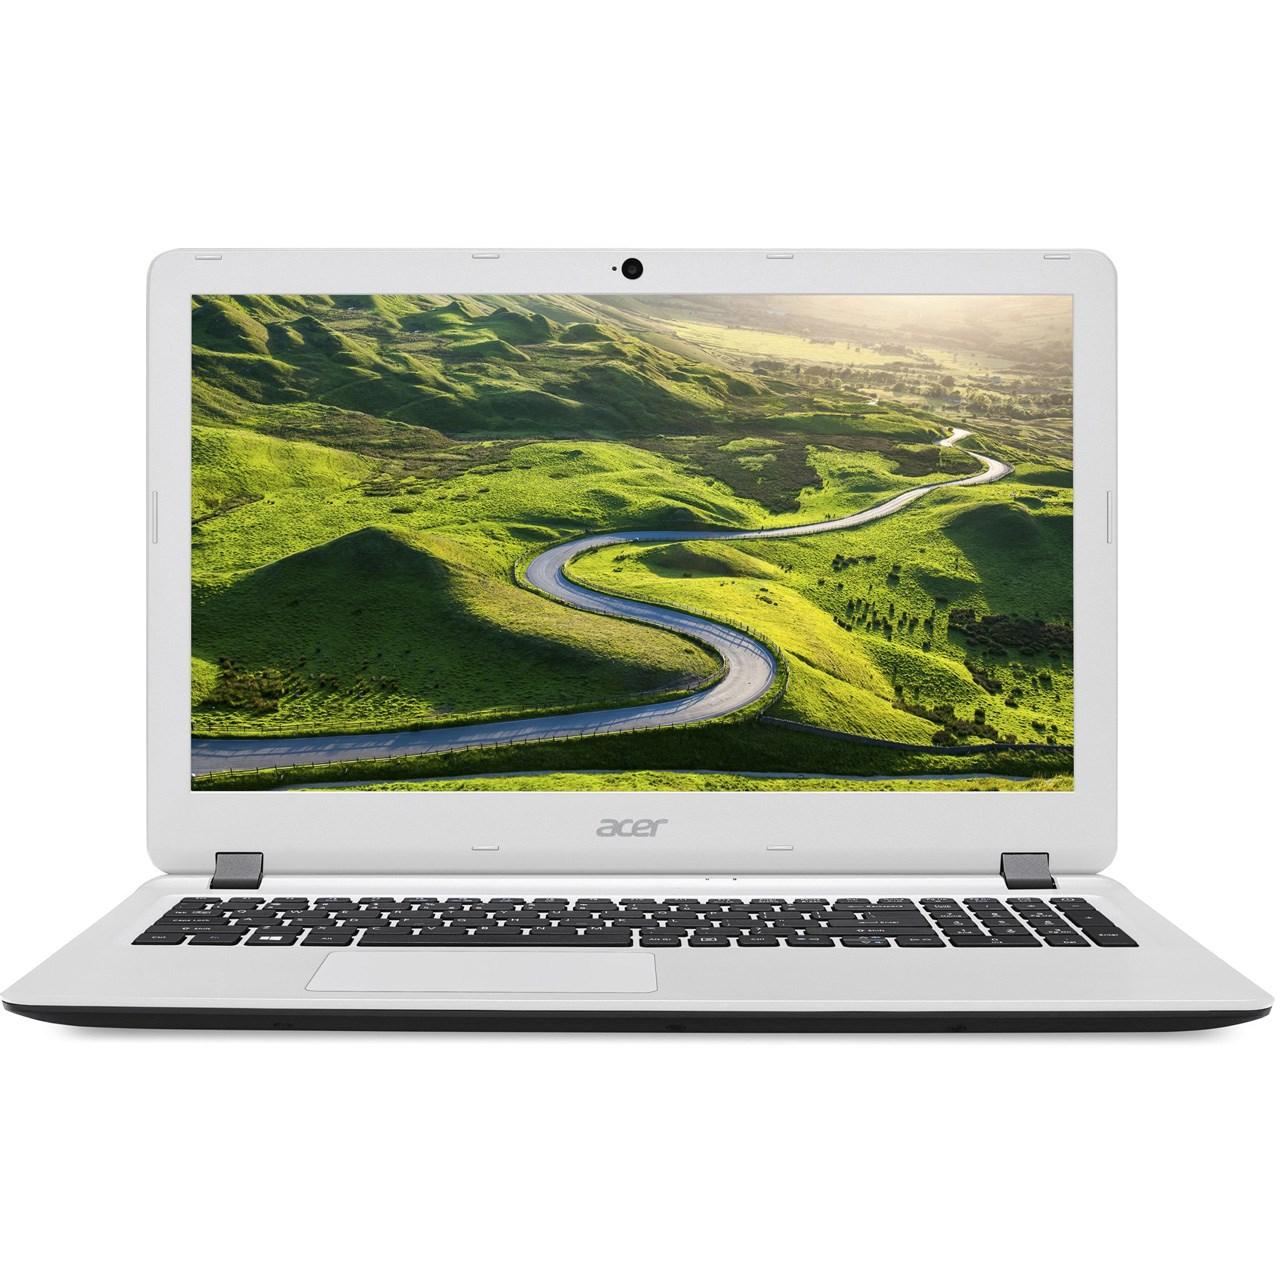 لپ تاپ 15 اینچی ایسر مدل Aspire ES1-533-P6HD | Acer Aspire ES1-533-P6HD - 15 inch Laptop